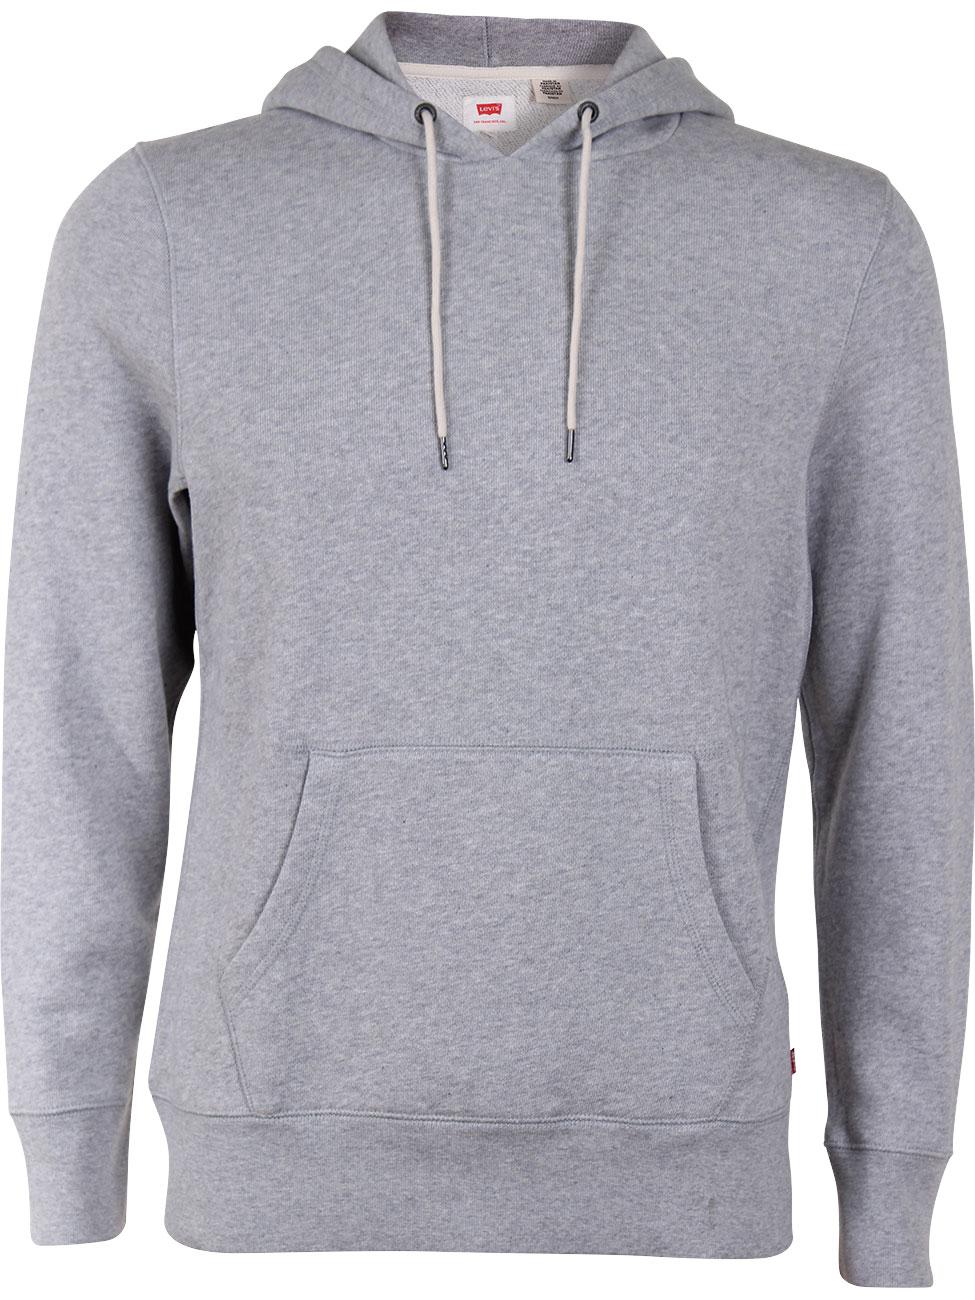 levi 39 s herren kapuzensweater original pullover hoodie ebay. Black Bedroom Furniture Sets. Home Design Ideas